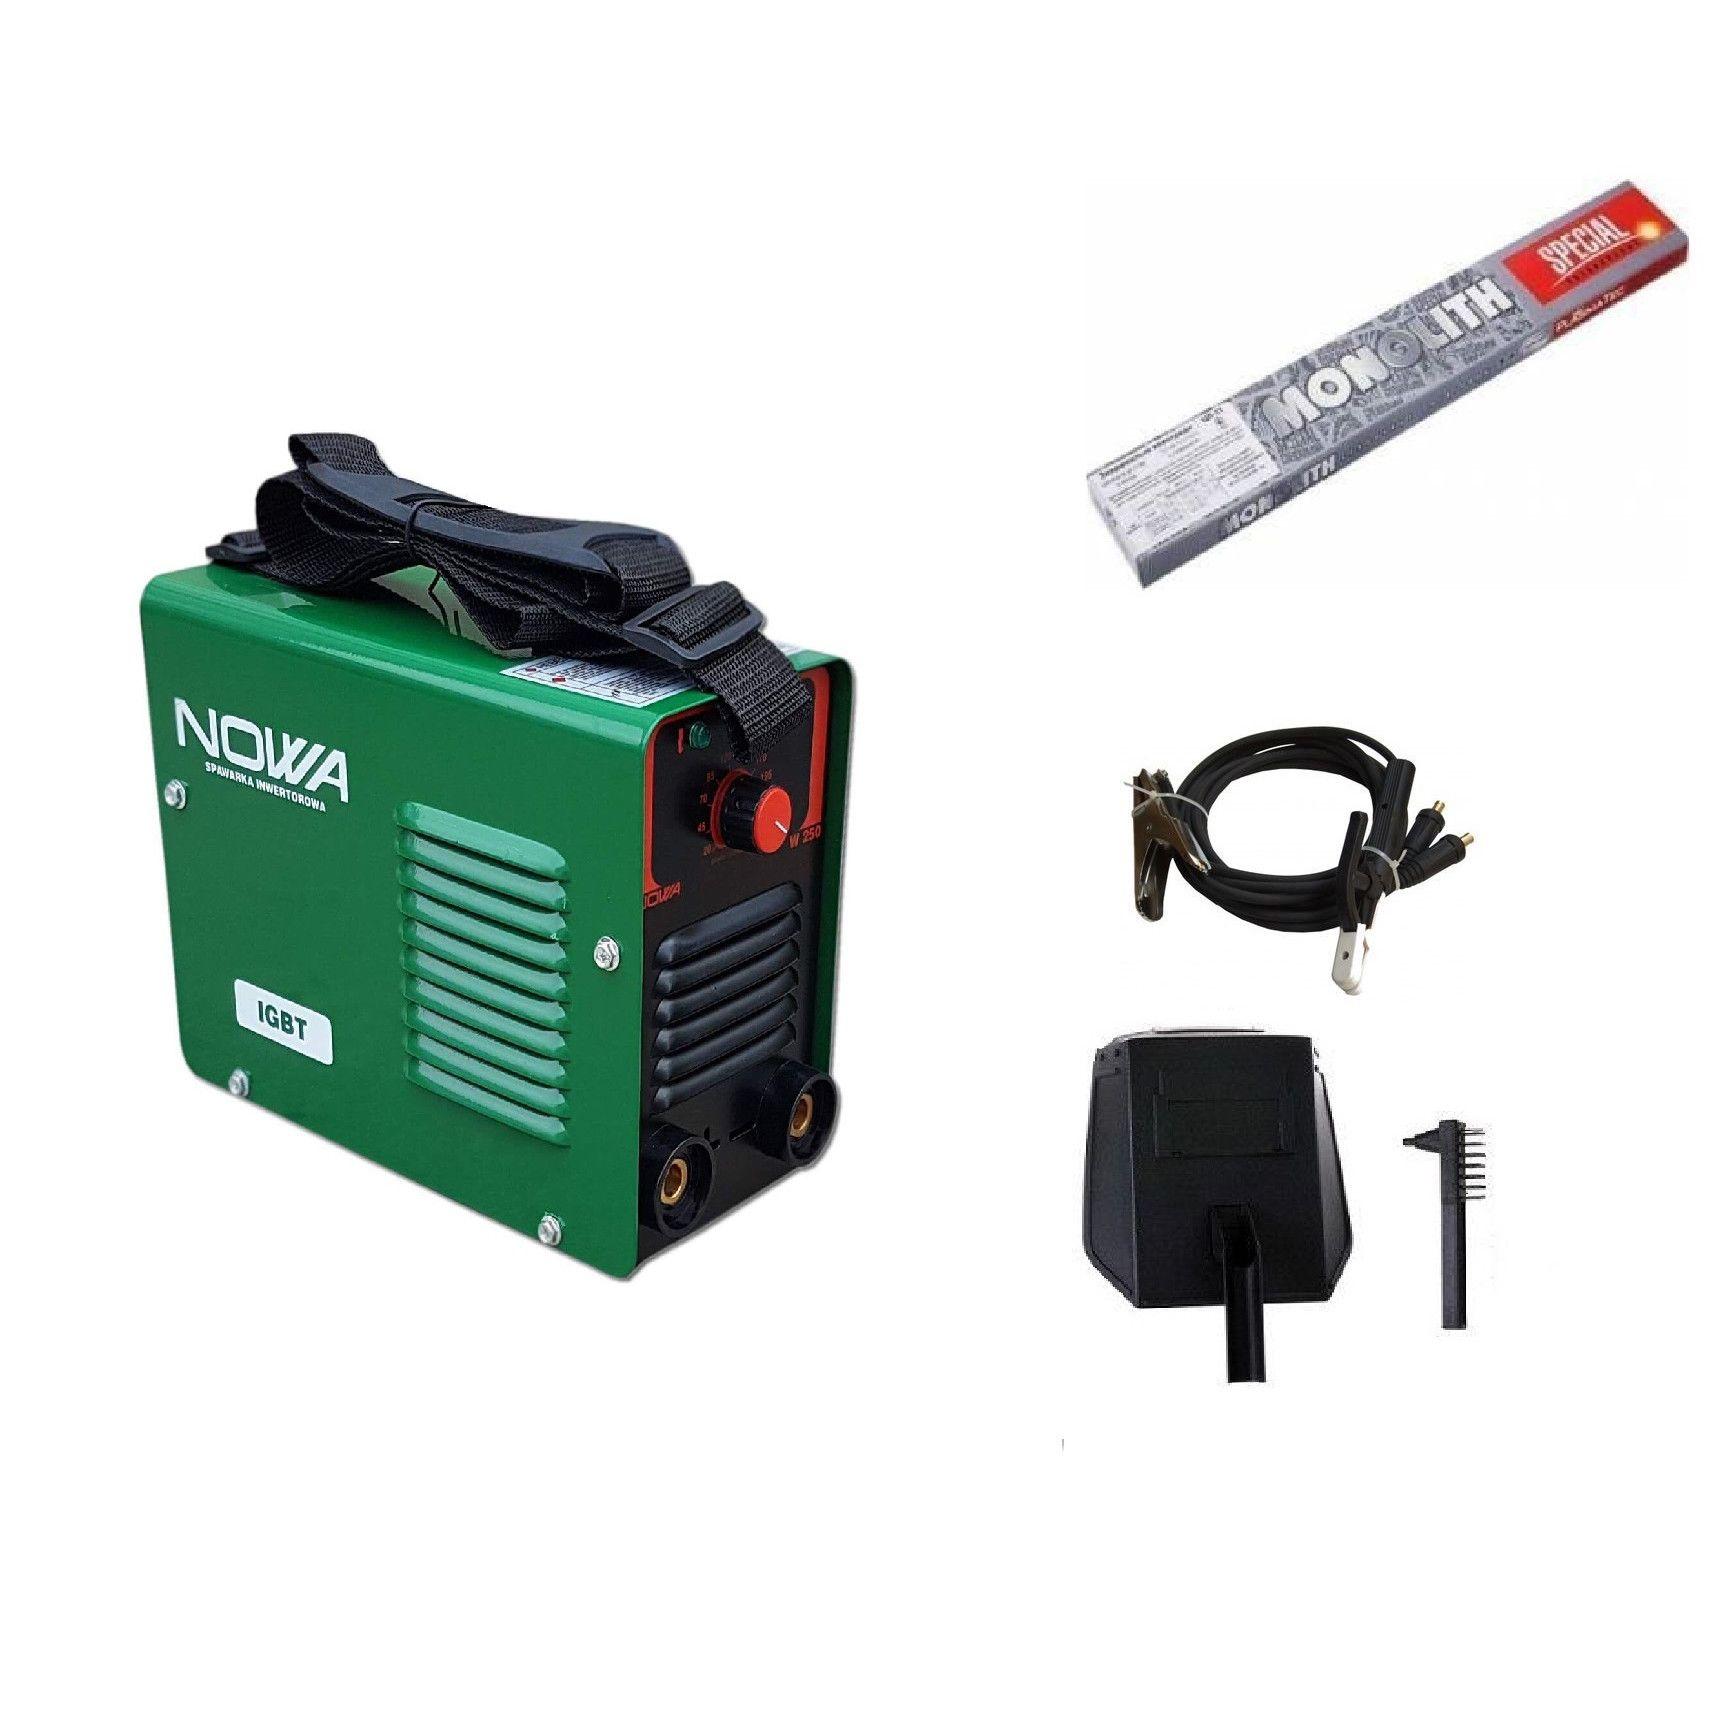 Image of Set Invertor sudura MMA Nowa 300a + Electrozi sudura 2.5 mm